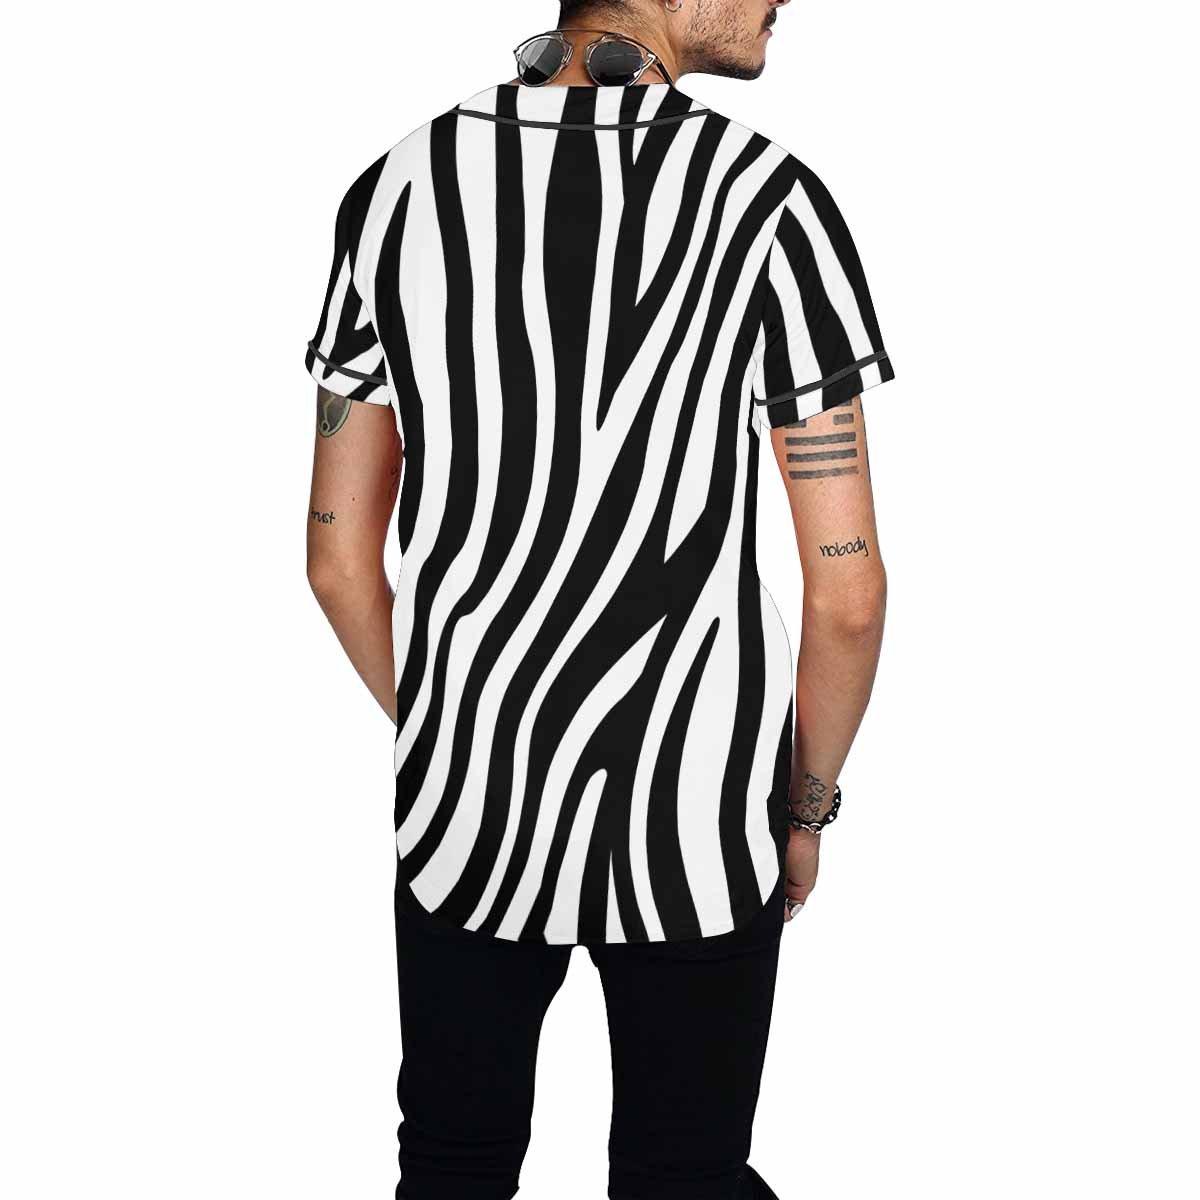 INTERESTPRINT Mens Button Down Baseball Jersey Zebra Stripes Pattern